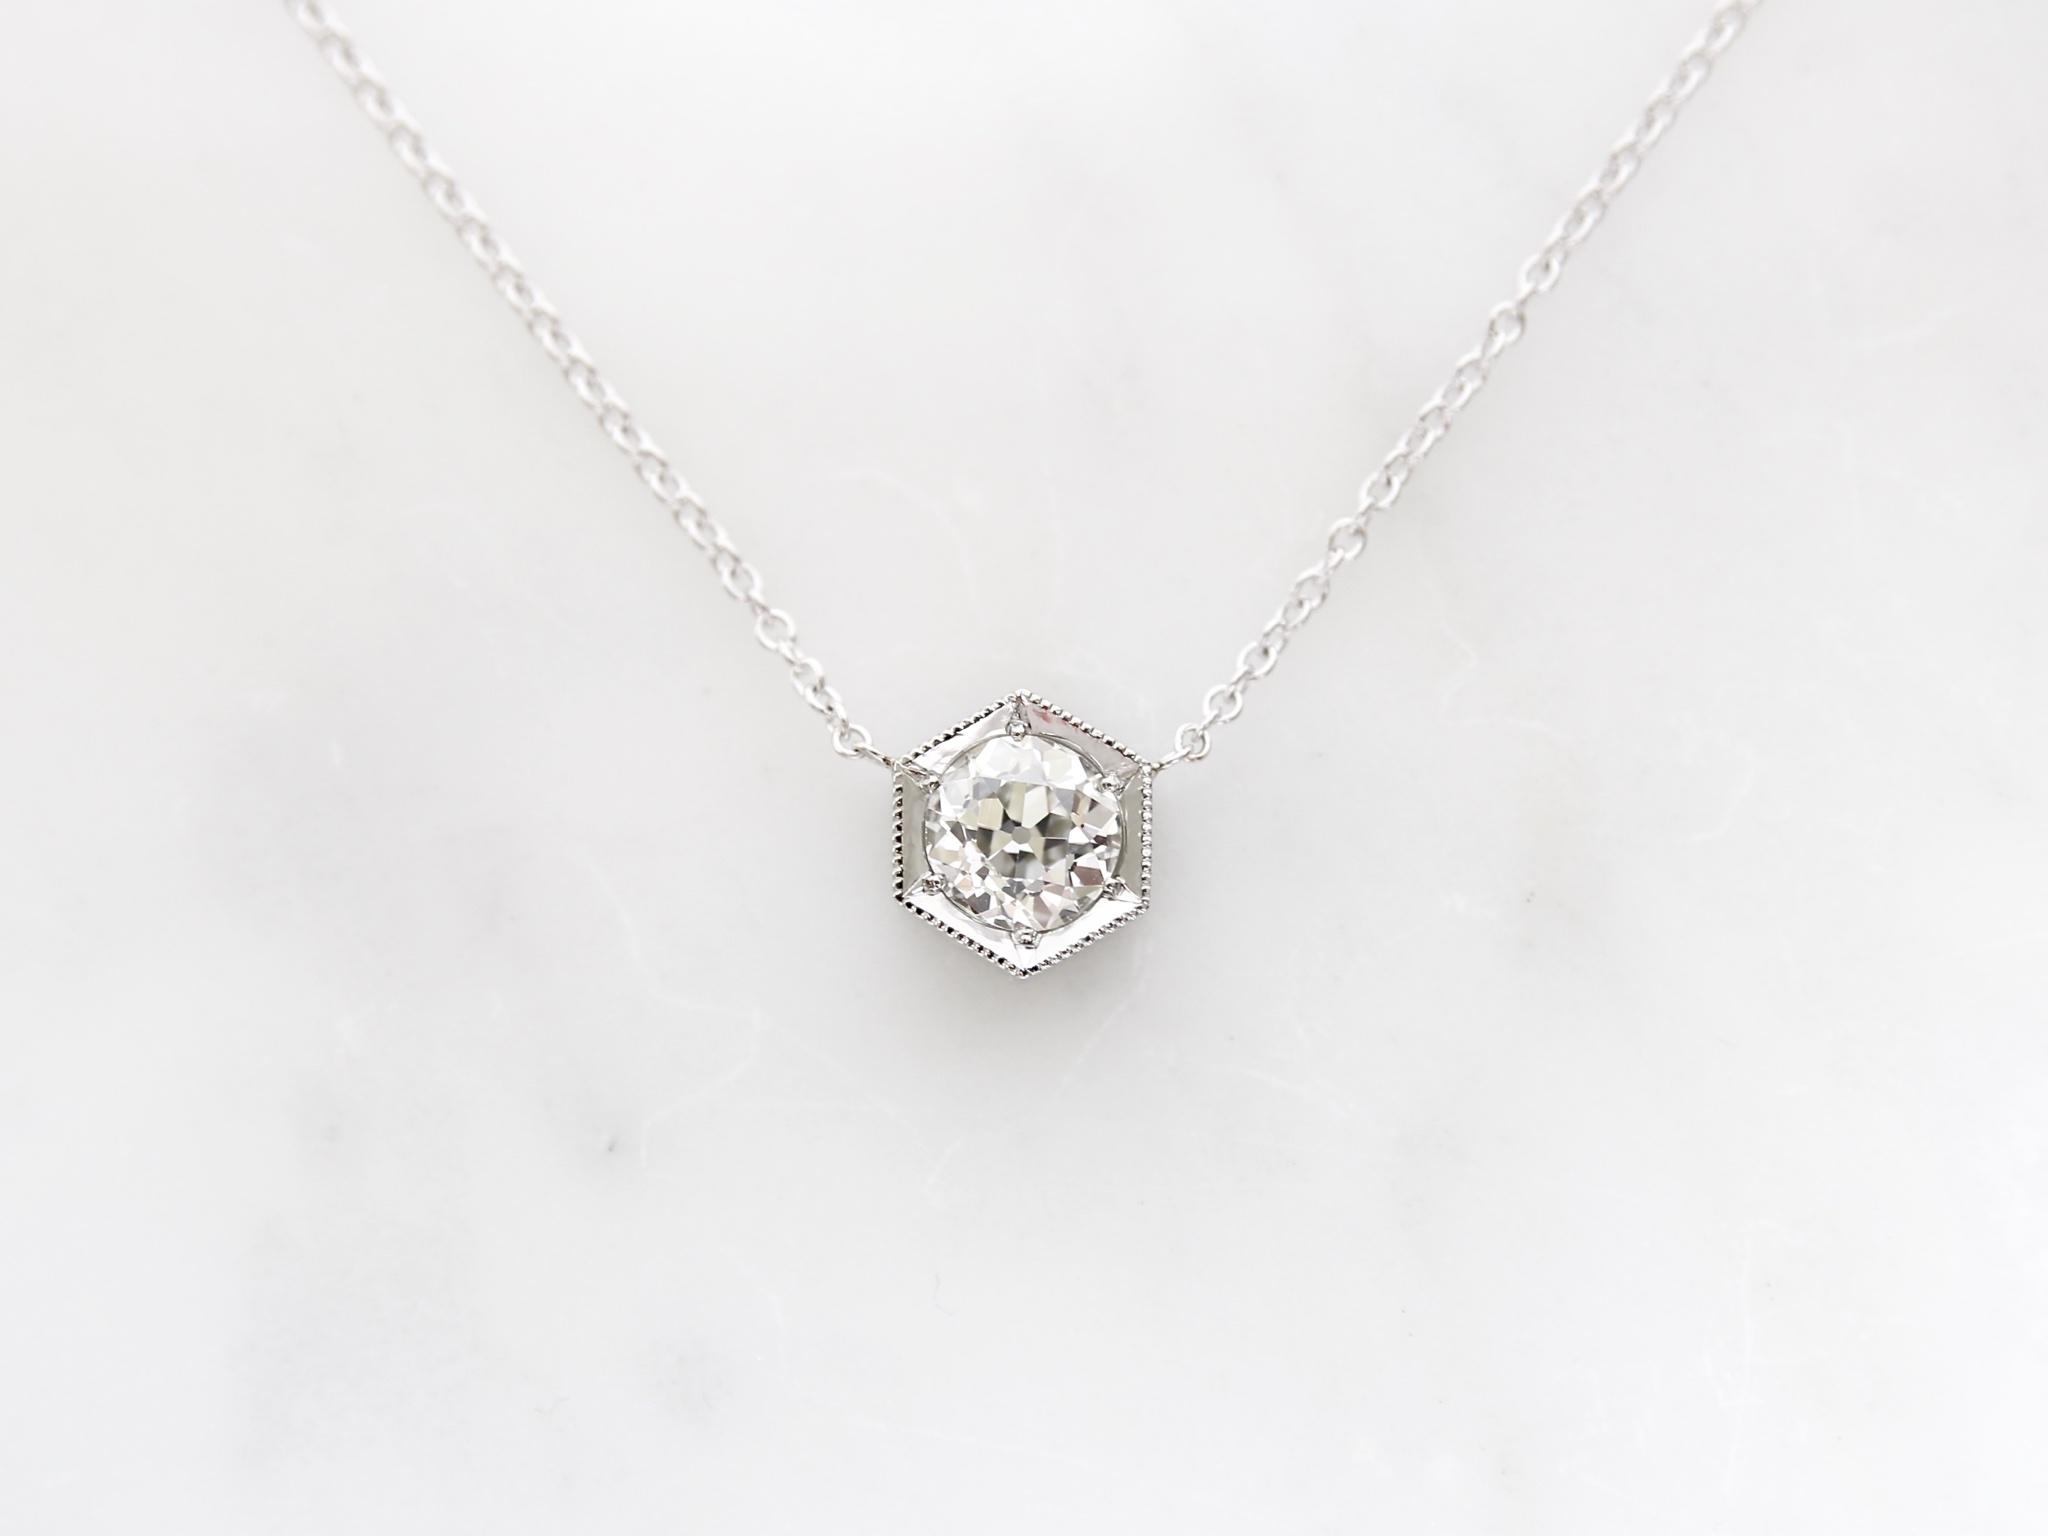 1.76ct old european cut diamond set in 14k white gold hexagon necklace